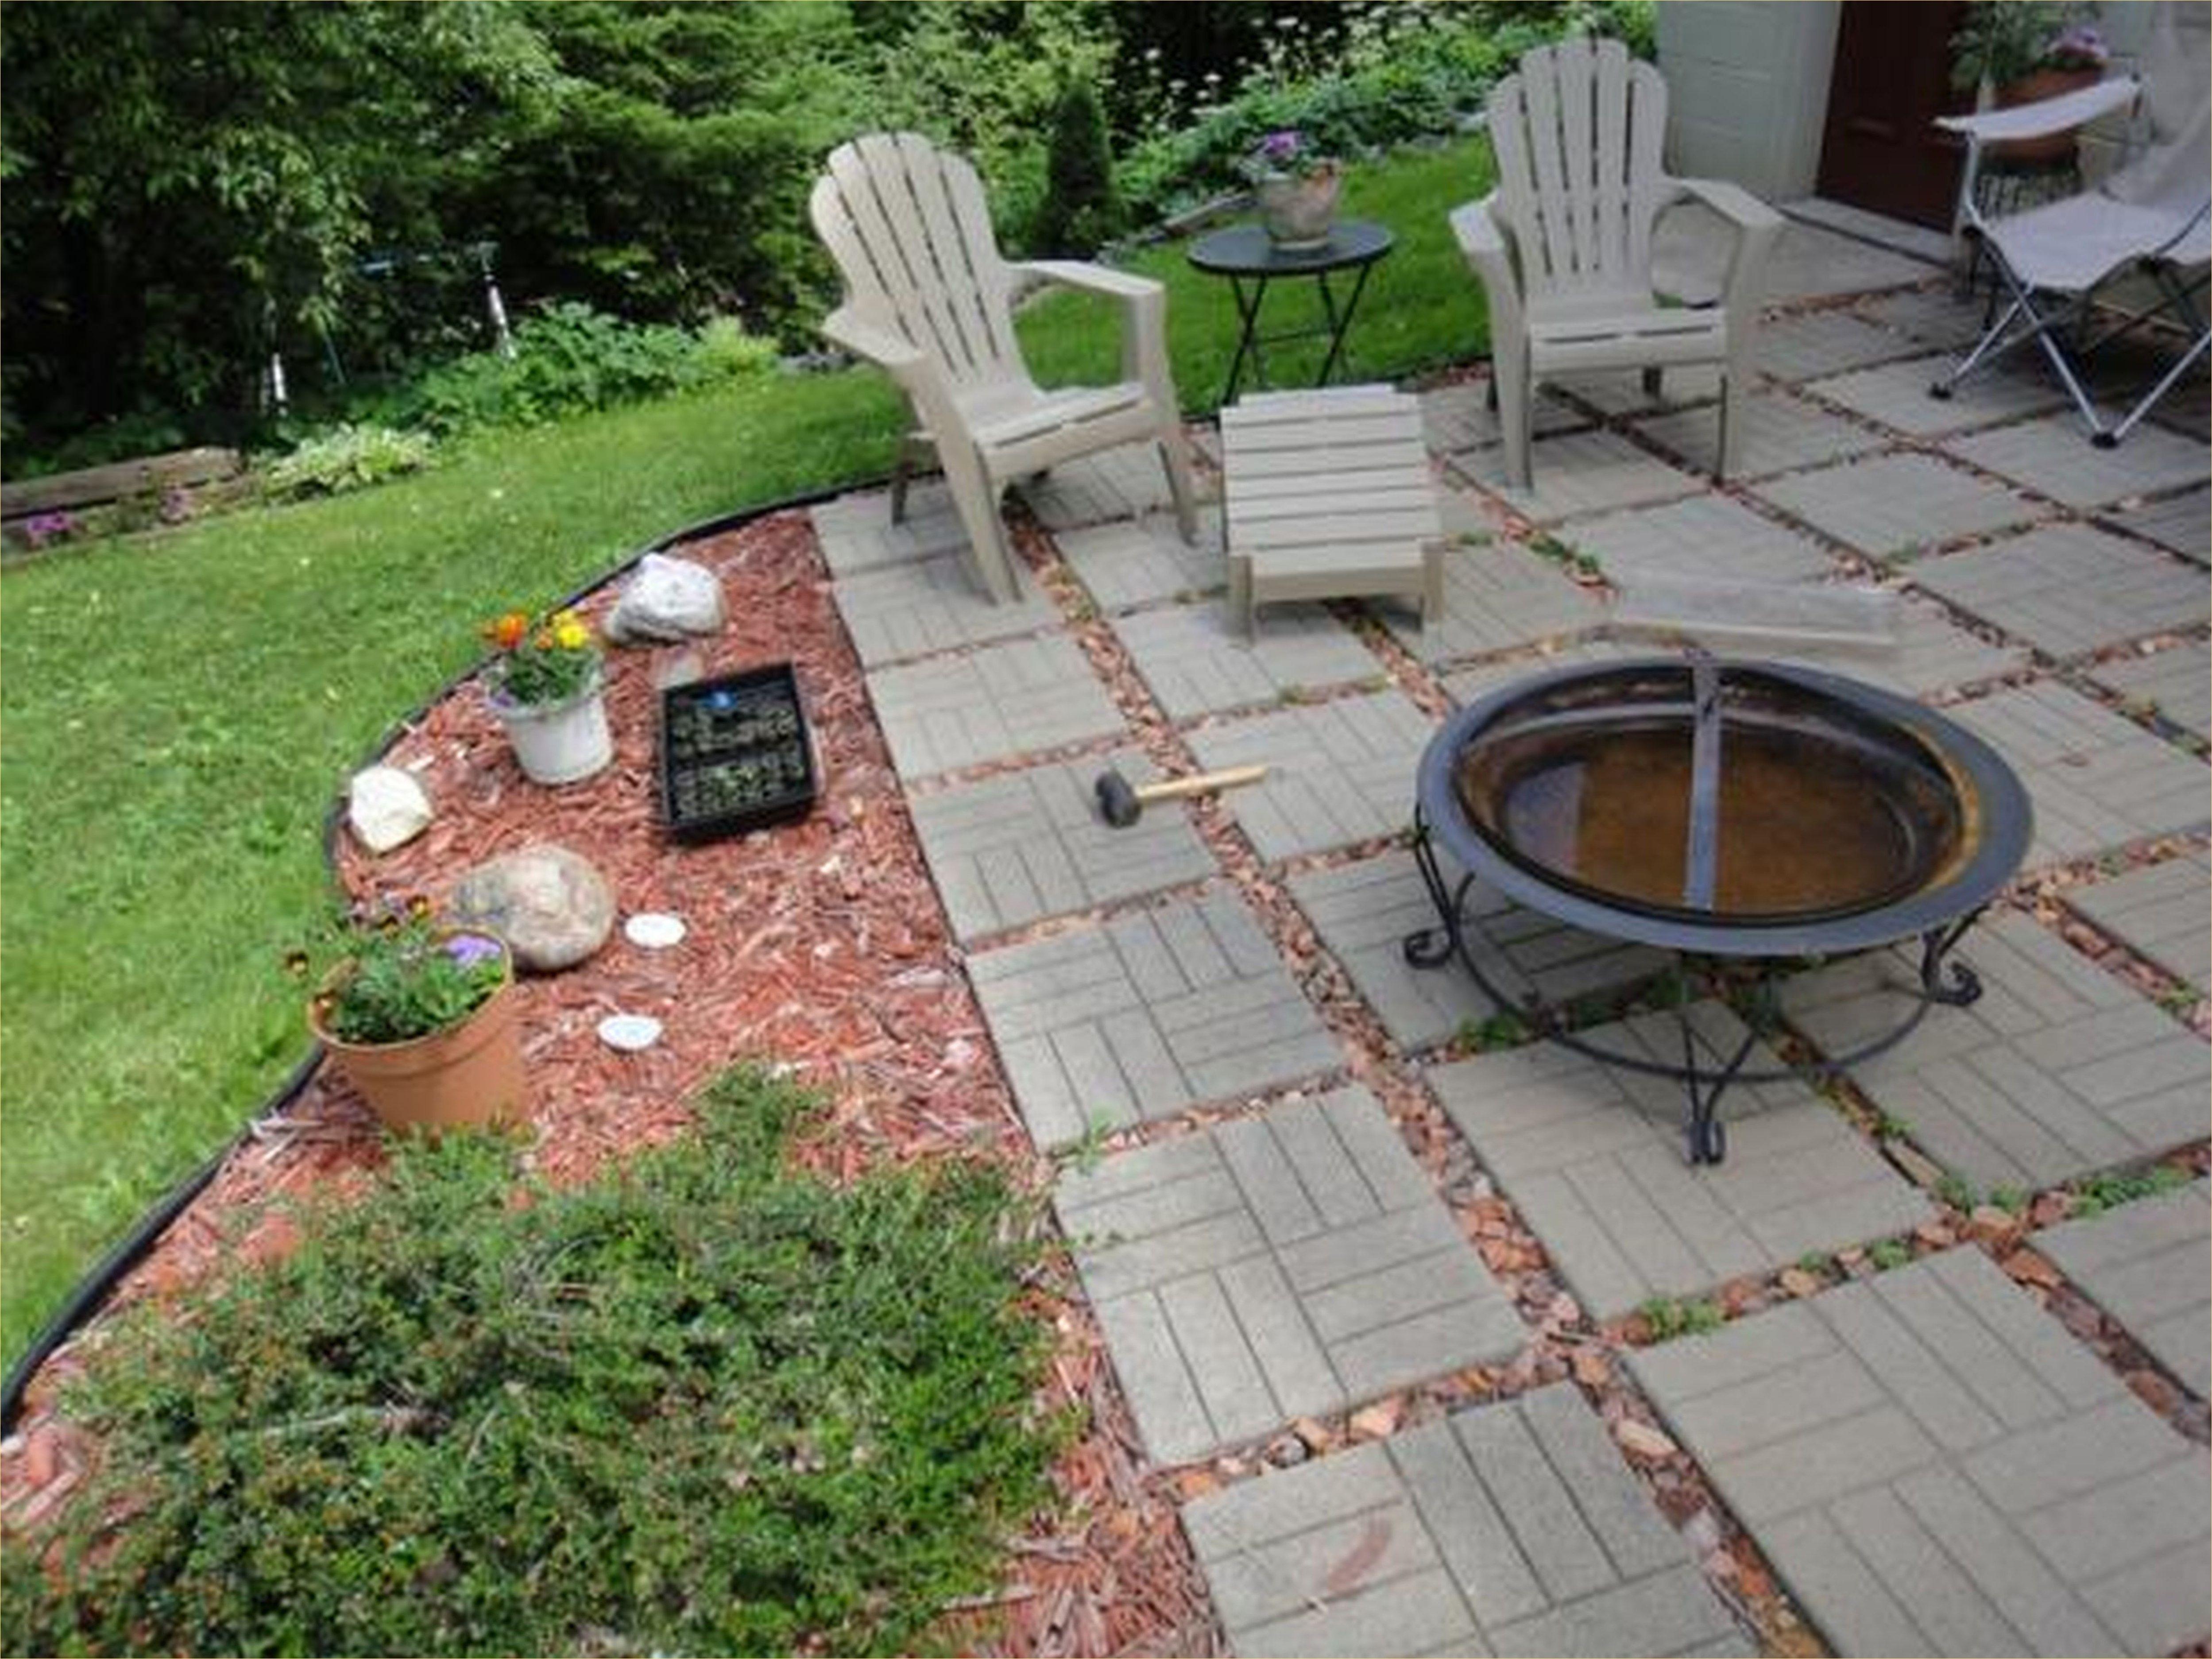 50 Stylish Small Backyard With Hardscape Ideas Landscaping Designs